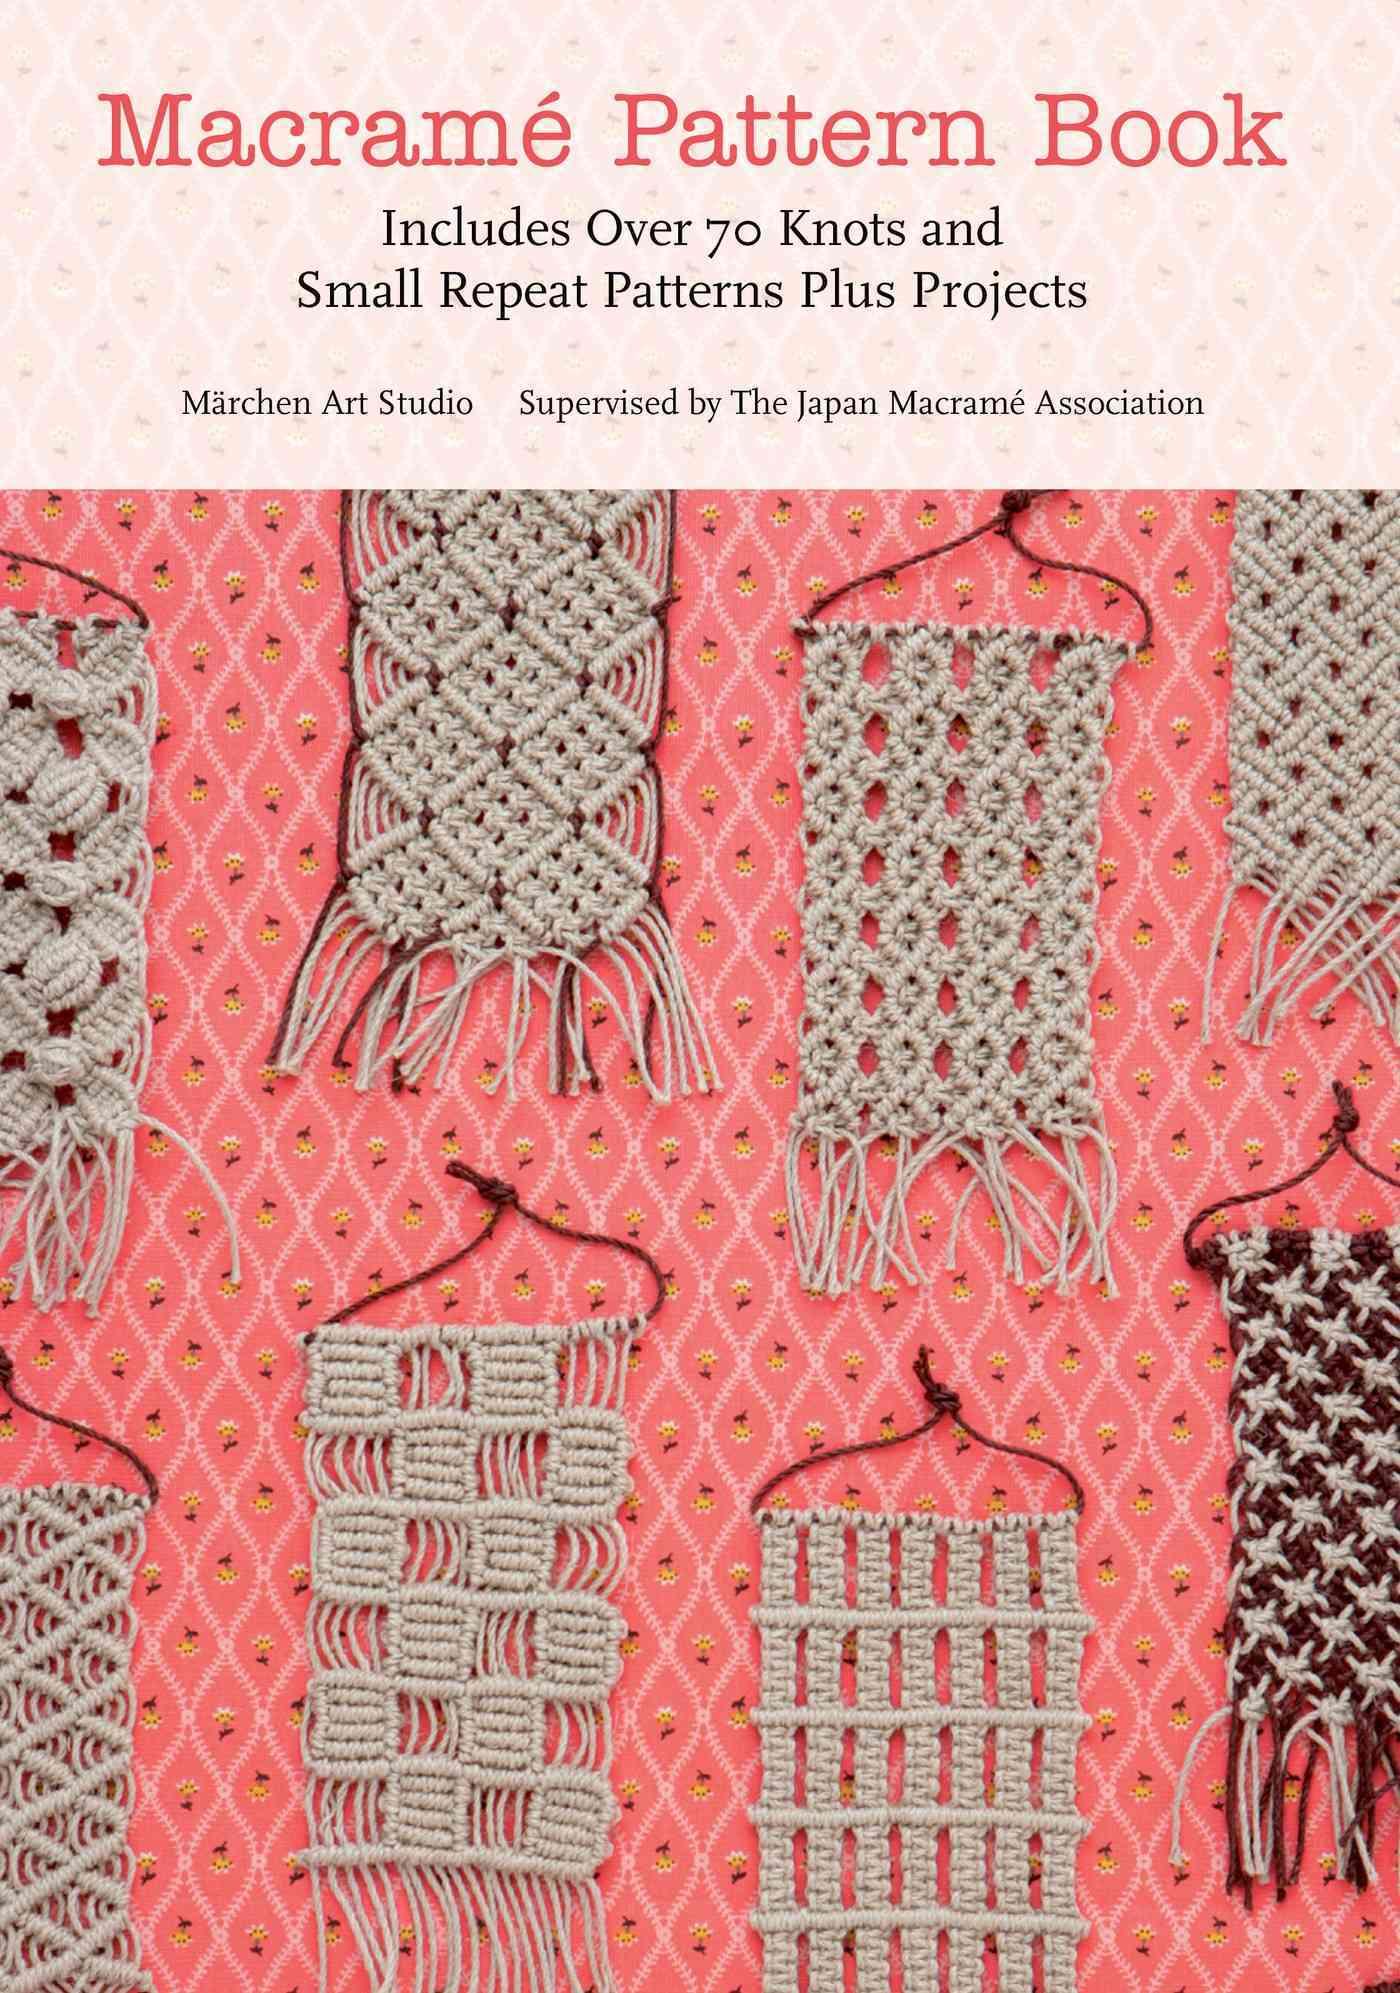 Macrame Pattern Book By Marchen Art